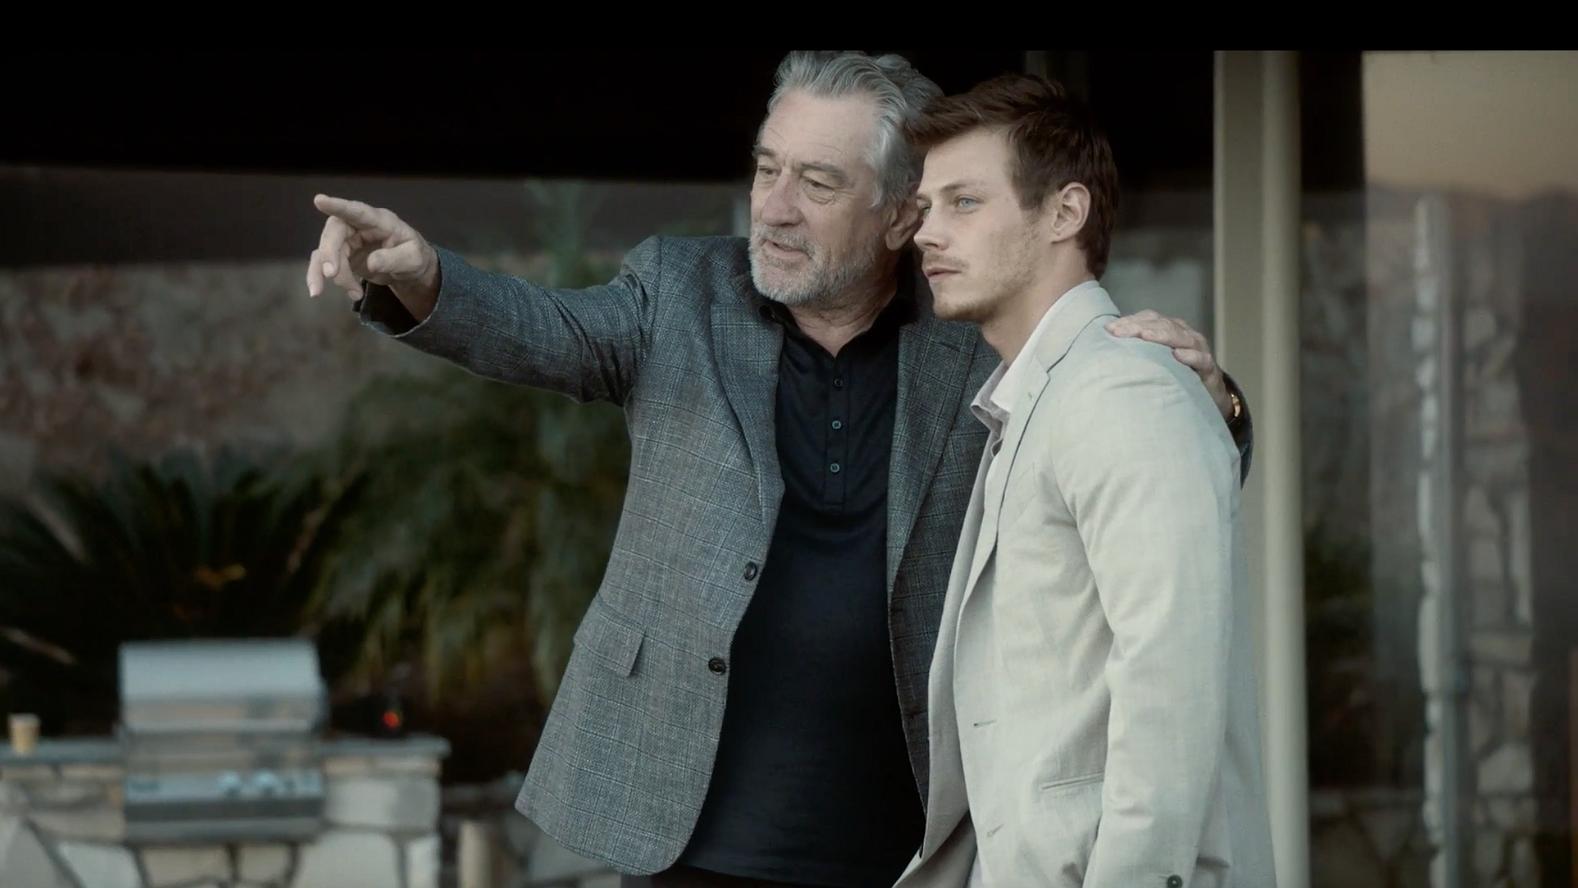 Robert De Niro en McCaul Lombardi het nieuwe gezicht van Ermenegildo Zegna